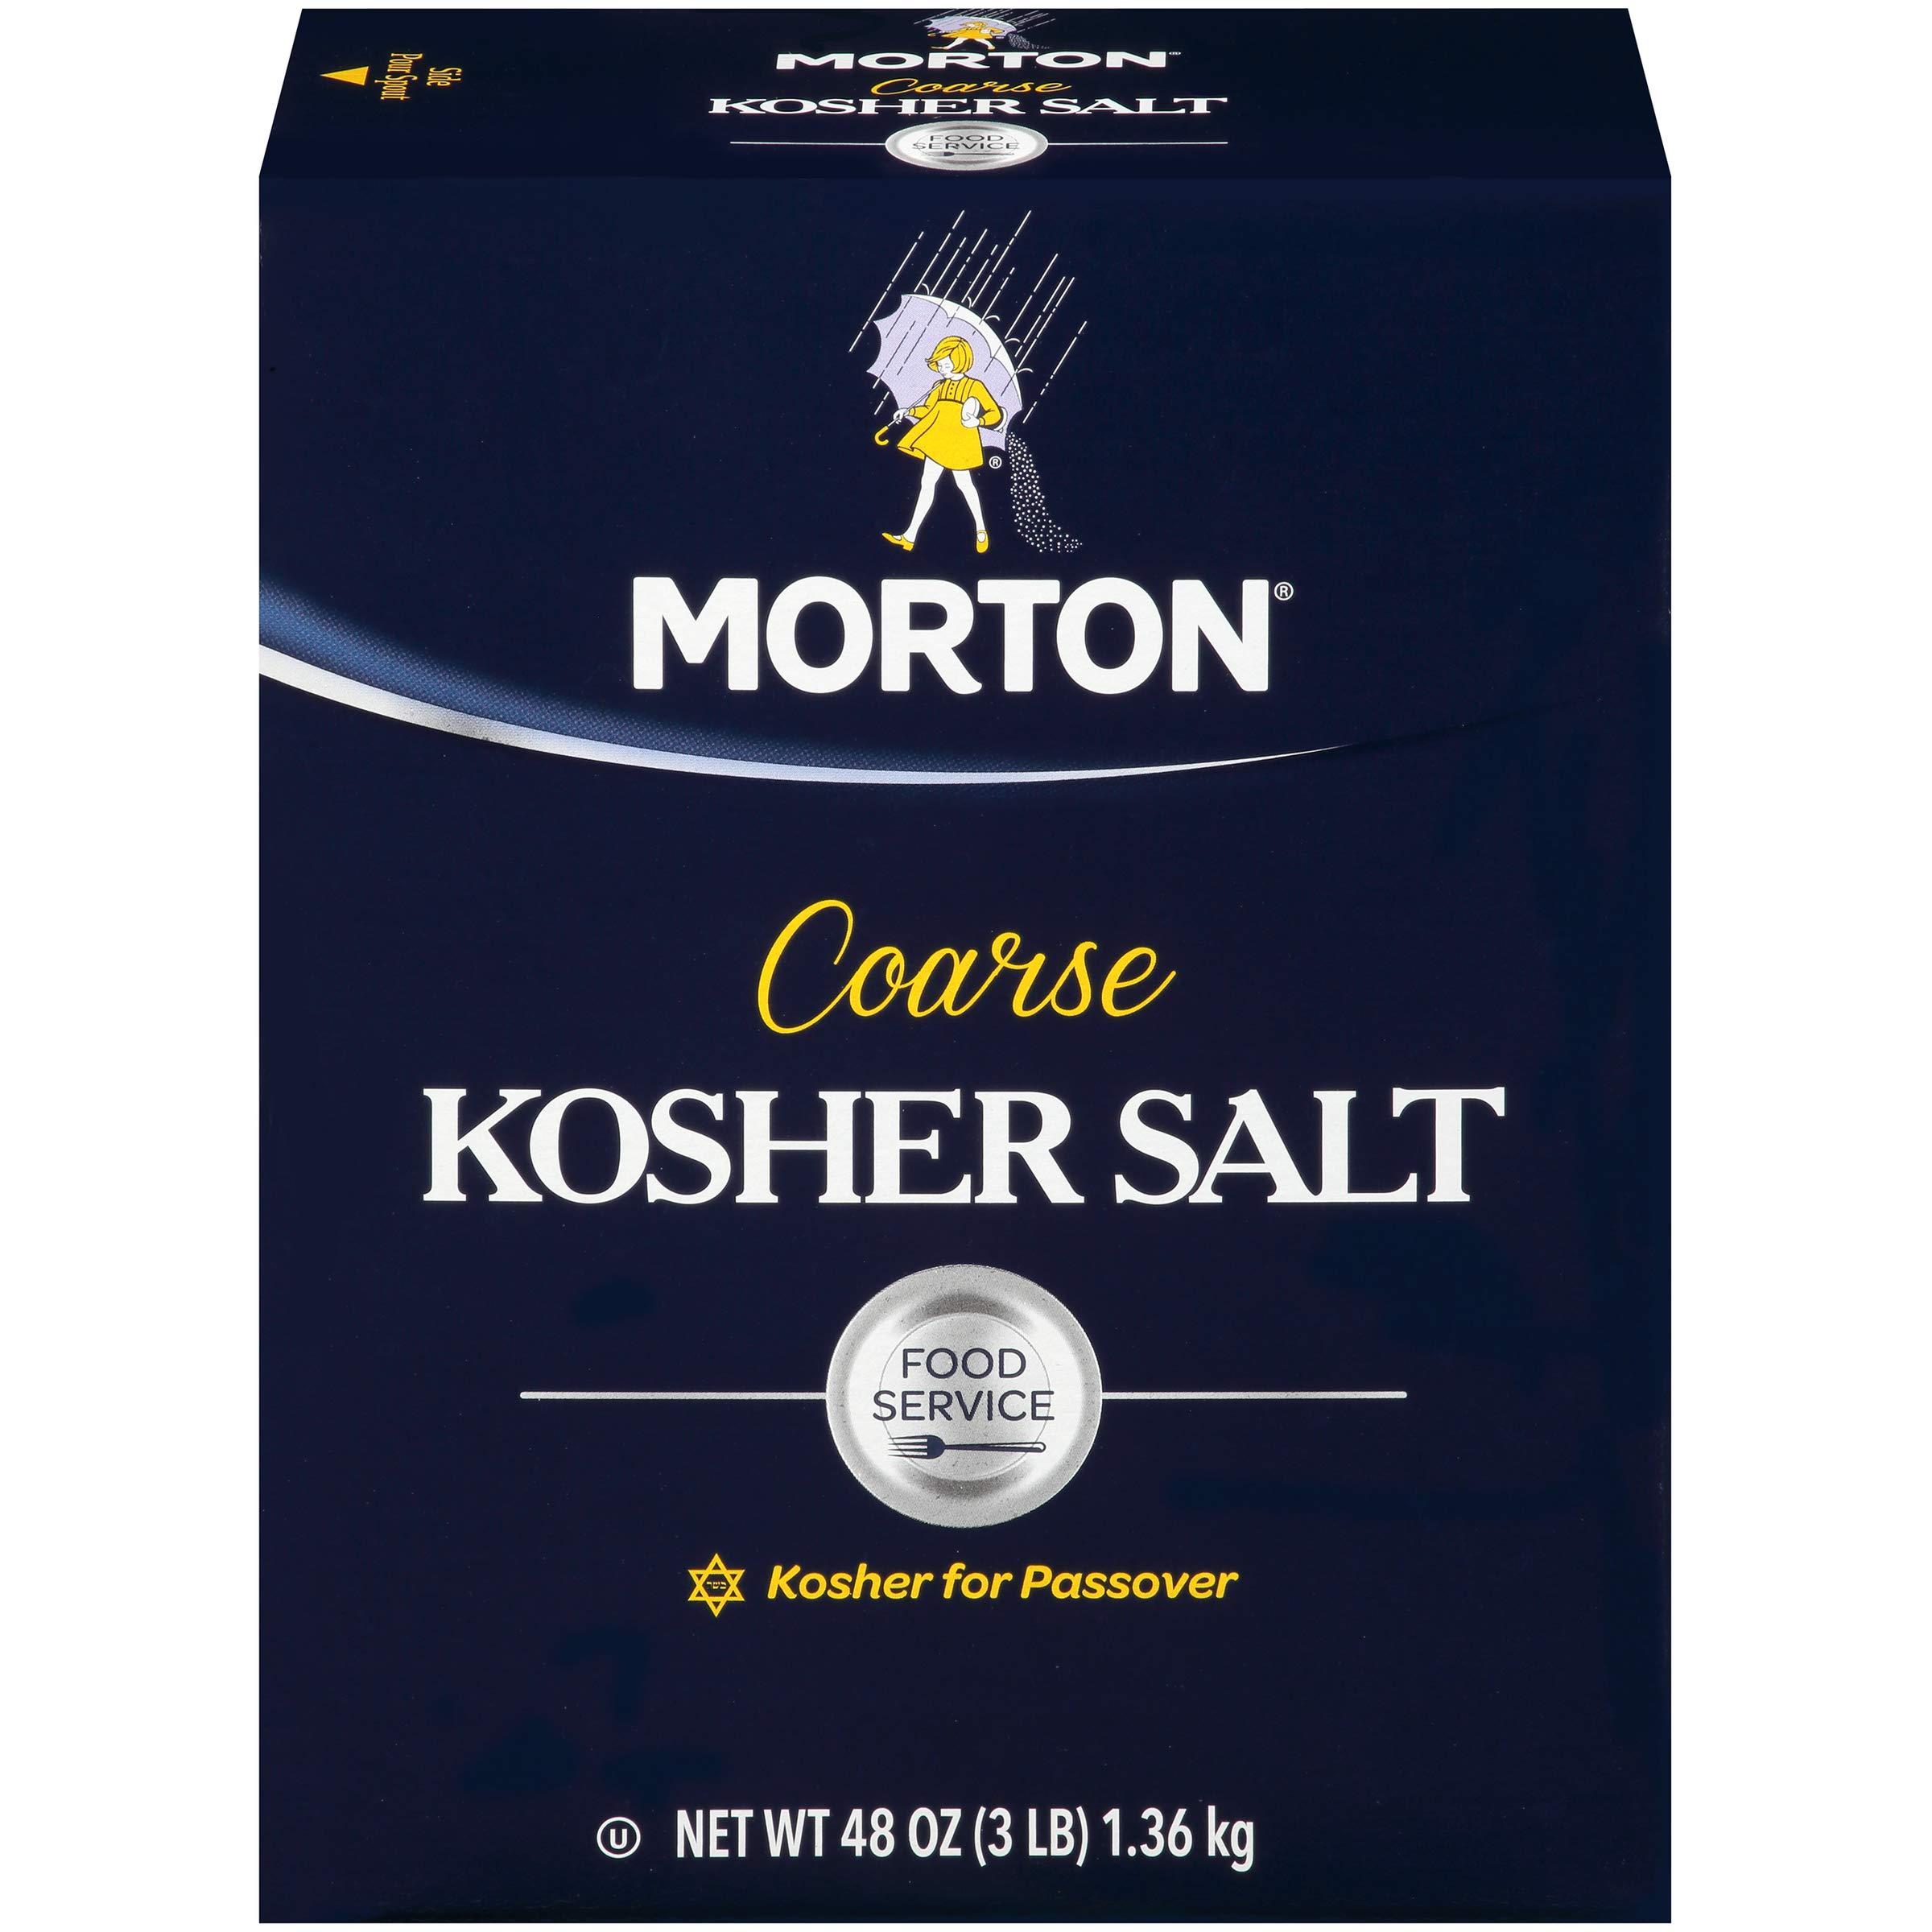 Morton Coarse Kosher Salt, 3 Pound by Morton